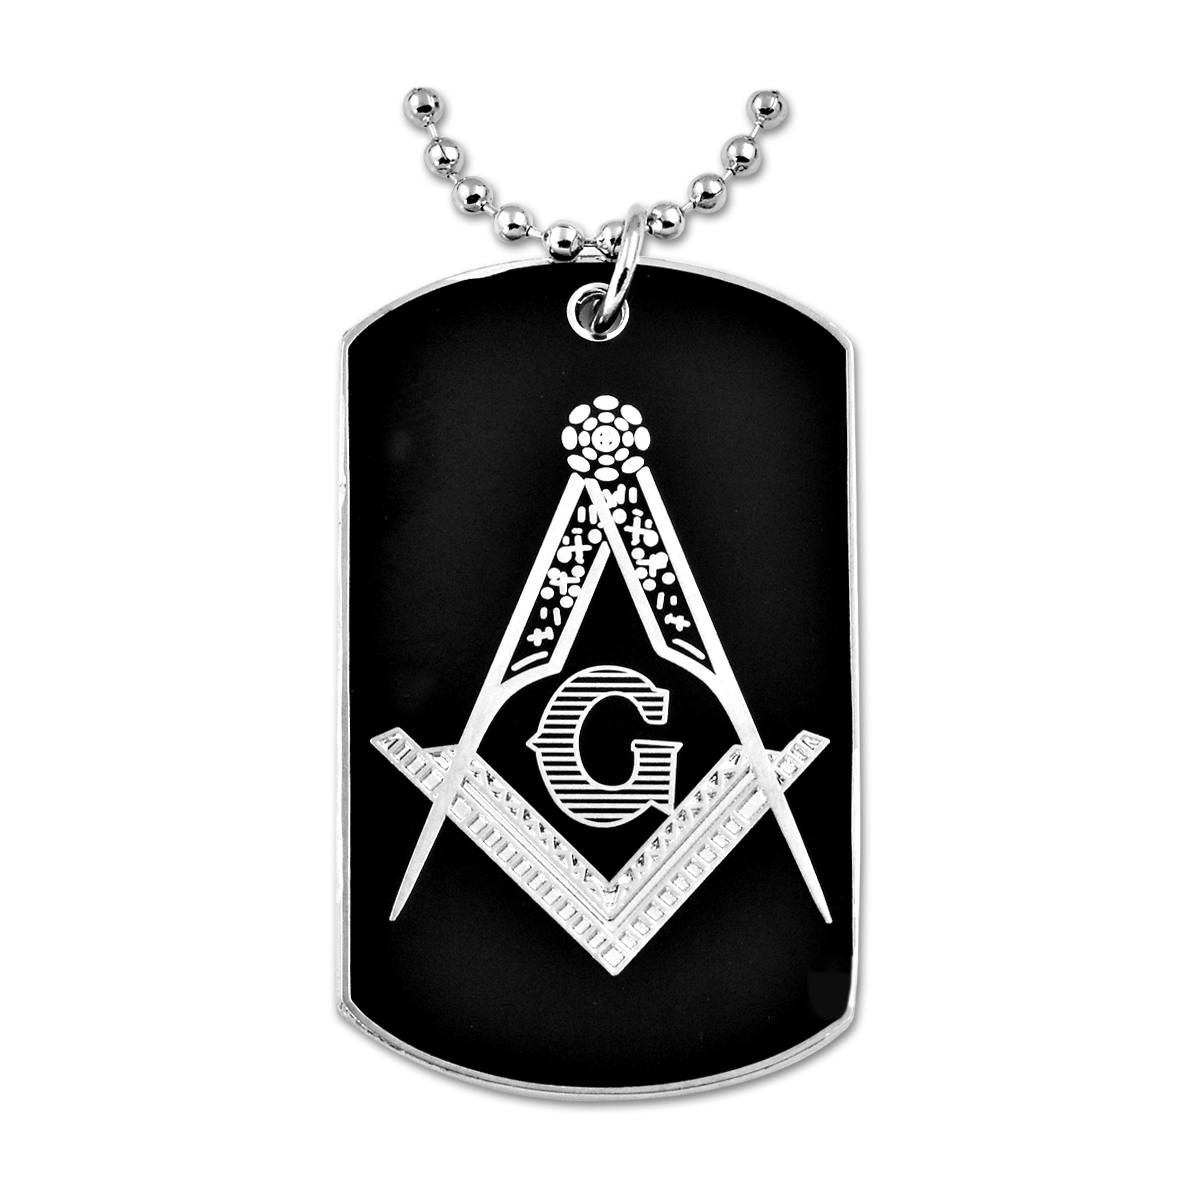 Engraved Dog Tag Necklace The Masonic Exchange